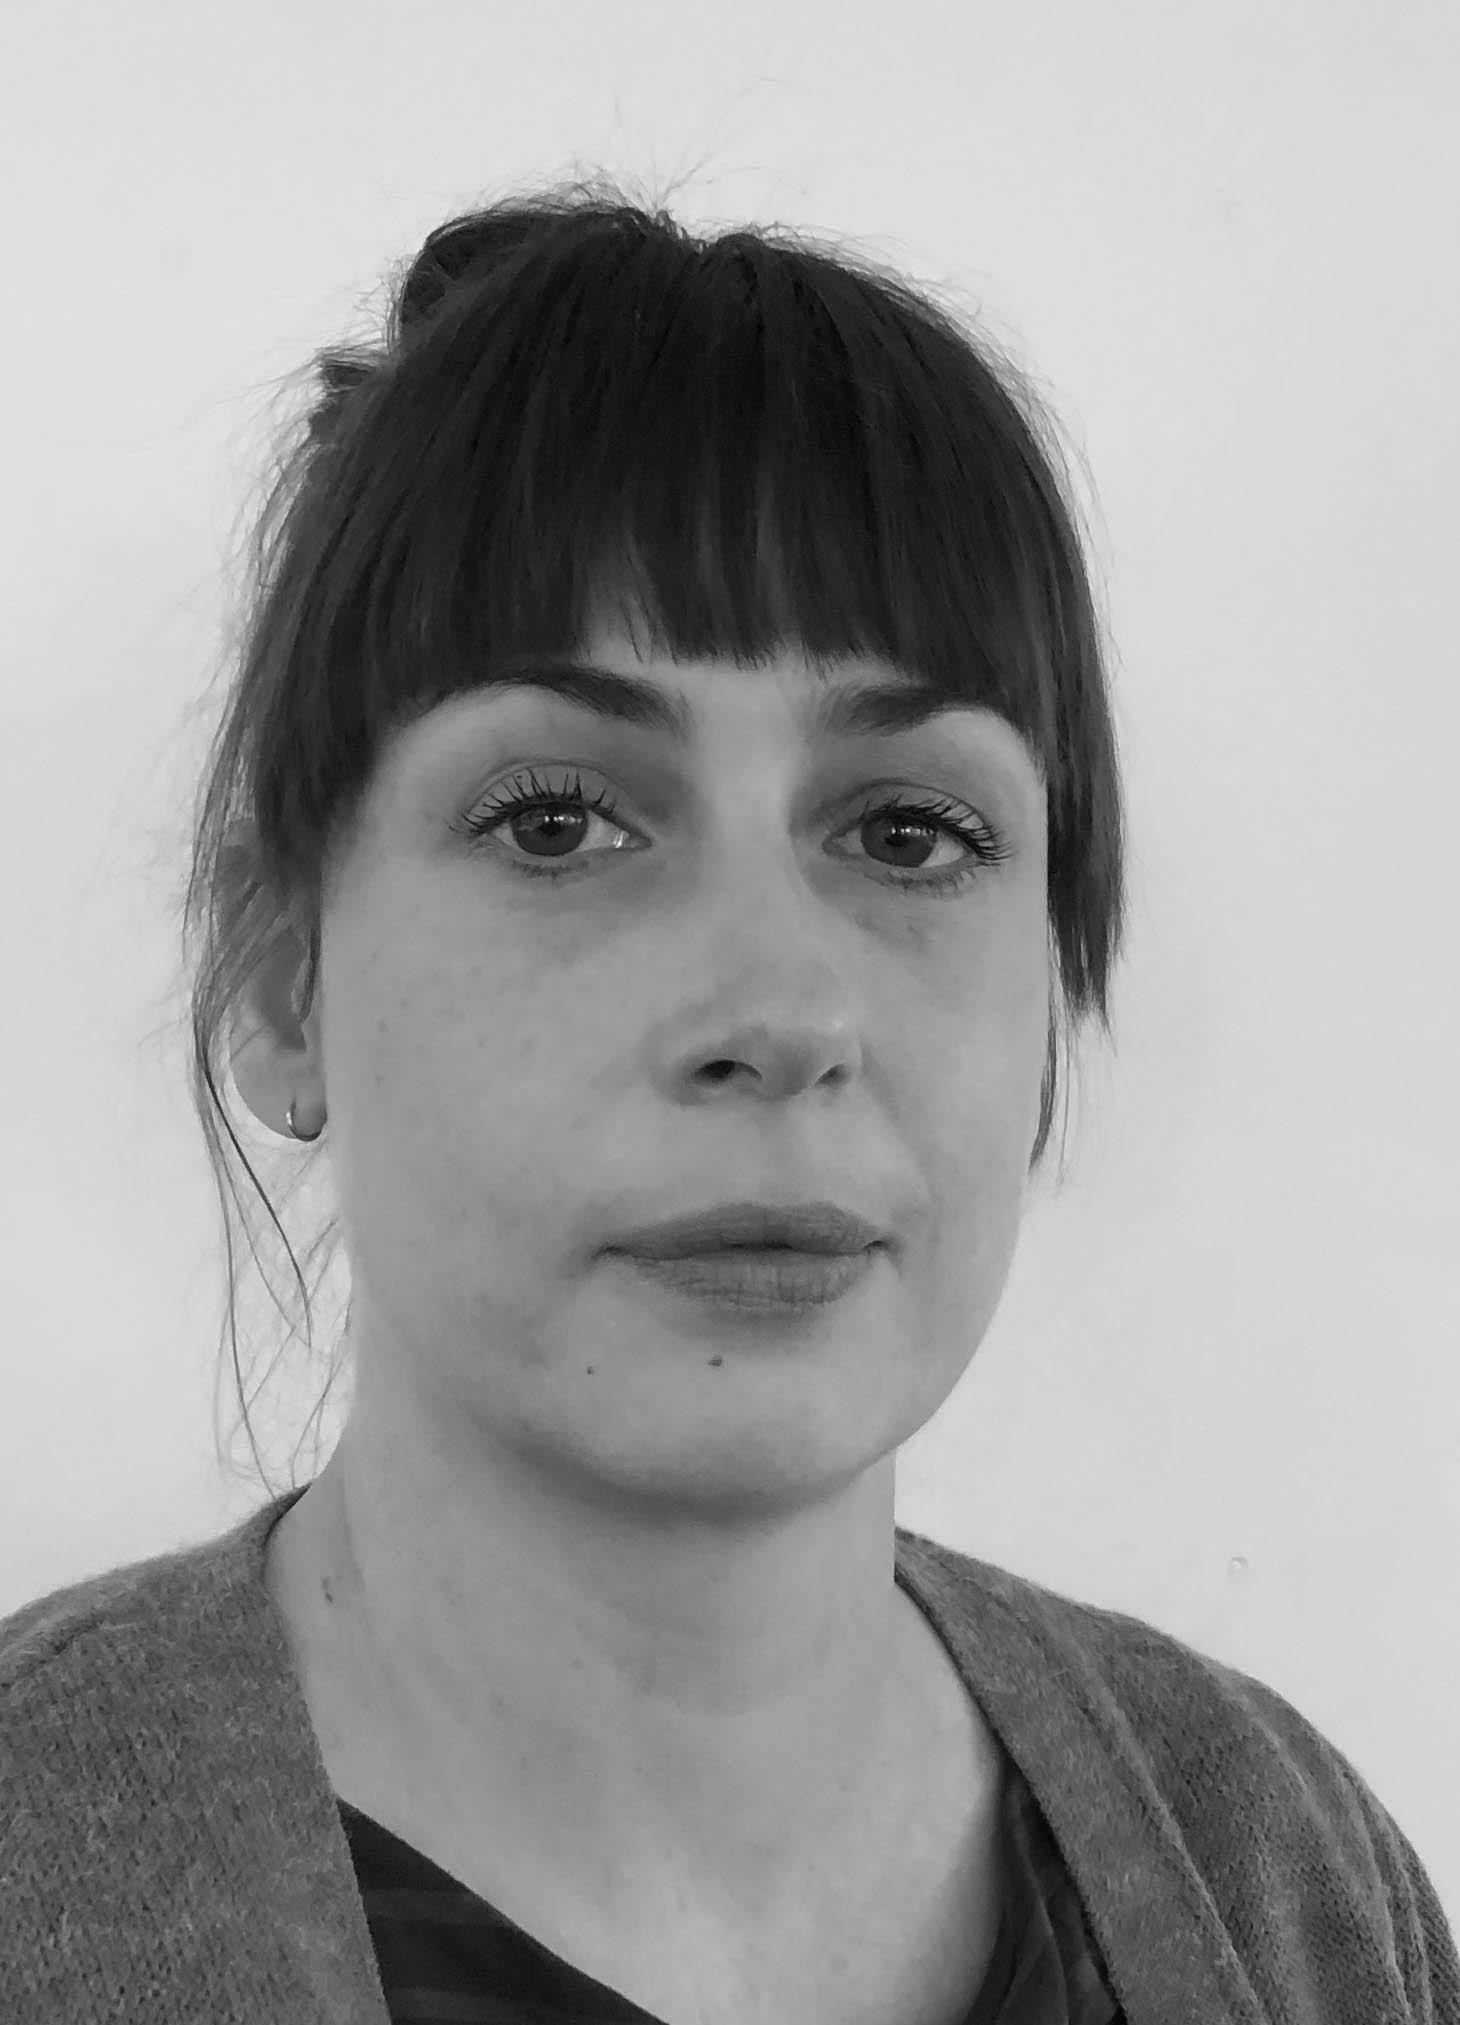 Astrid Kathinka Mokkelbost Prosjektleder  astrid@botekas.no  Tel. 940 877 99